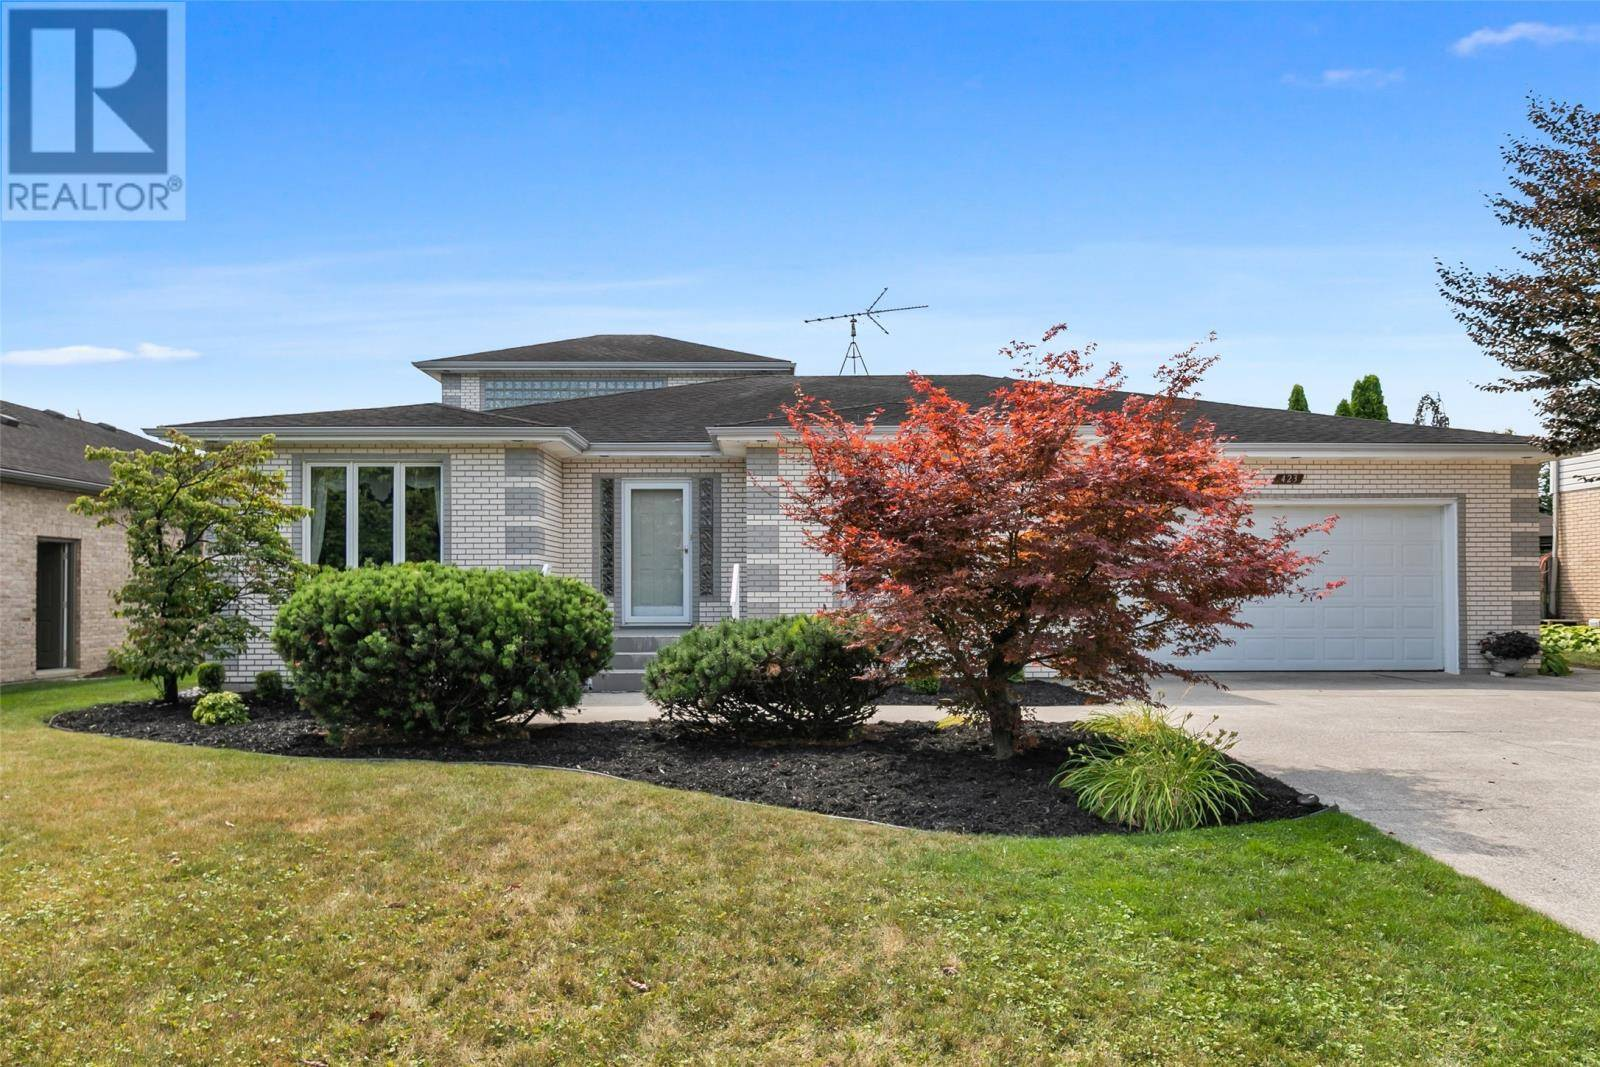 House for sale at 423 Corbett Dr Lakeshore Ontario - MLS: 19025459